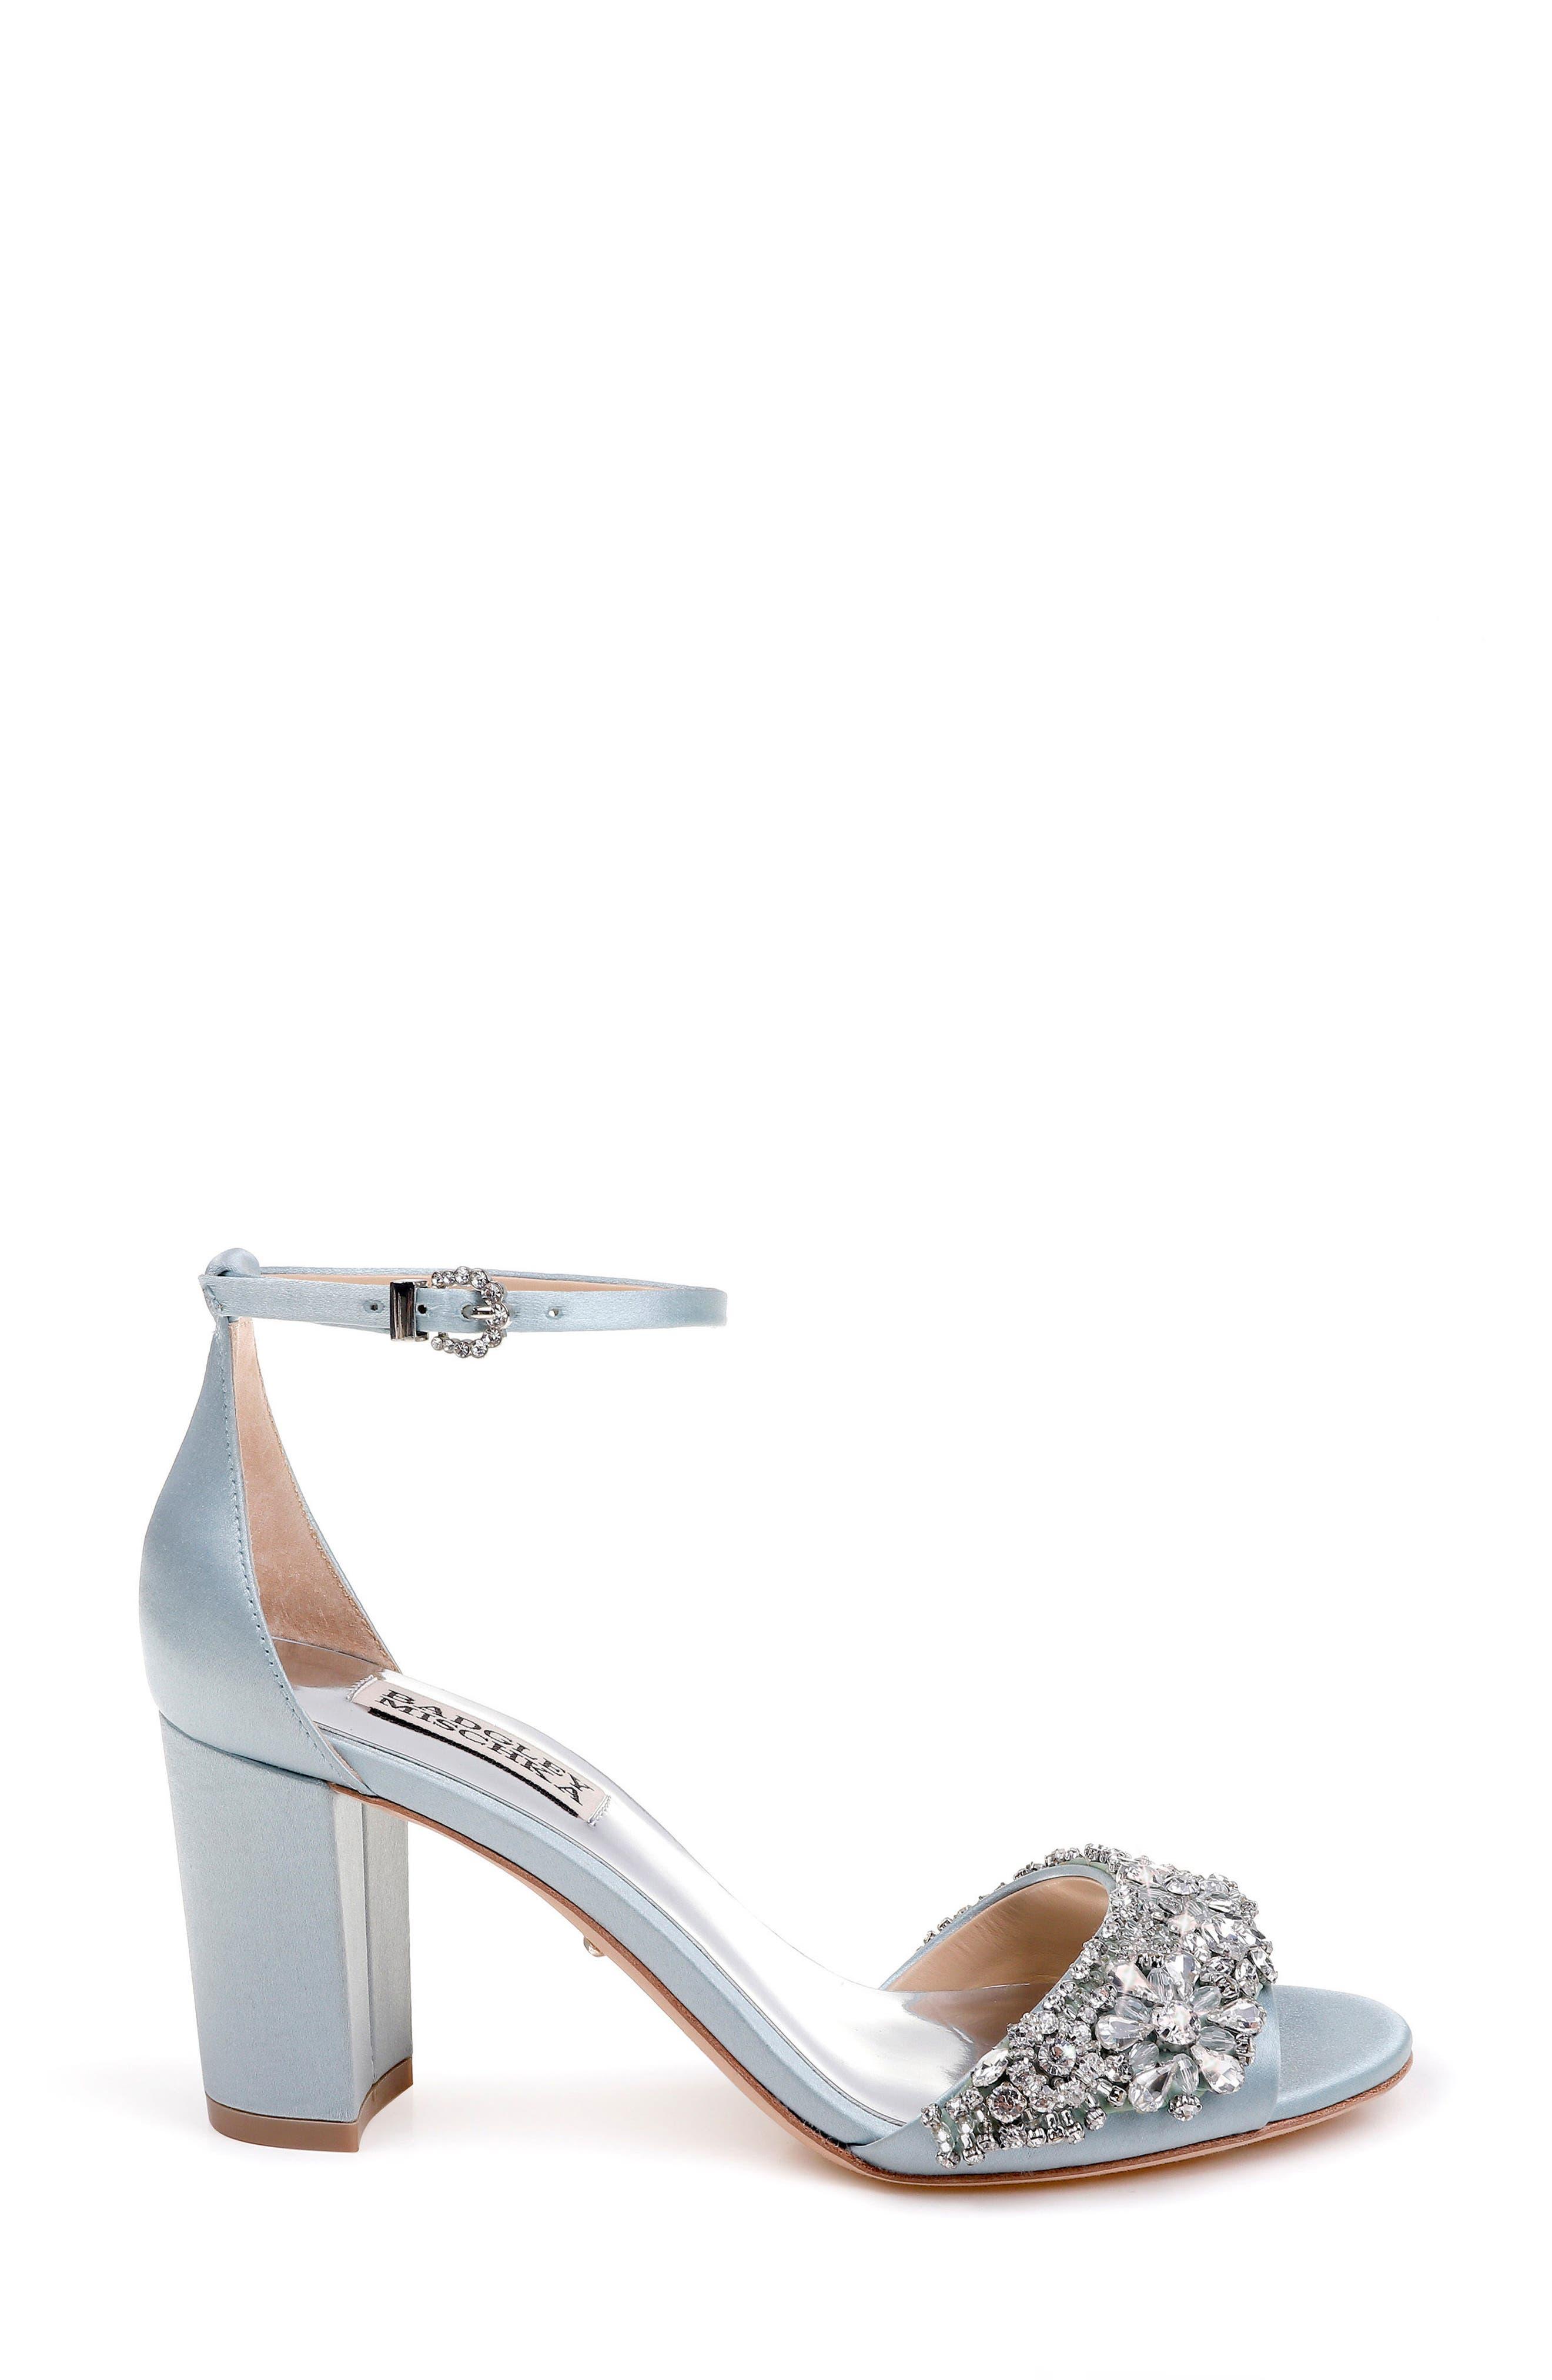 Hines Embellished Block Heel Sandal,                             Alternate thumbnail 14, color,